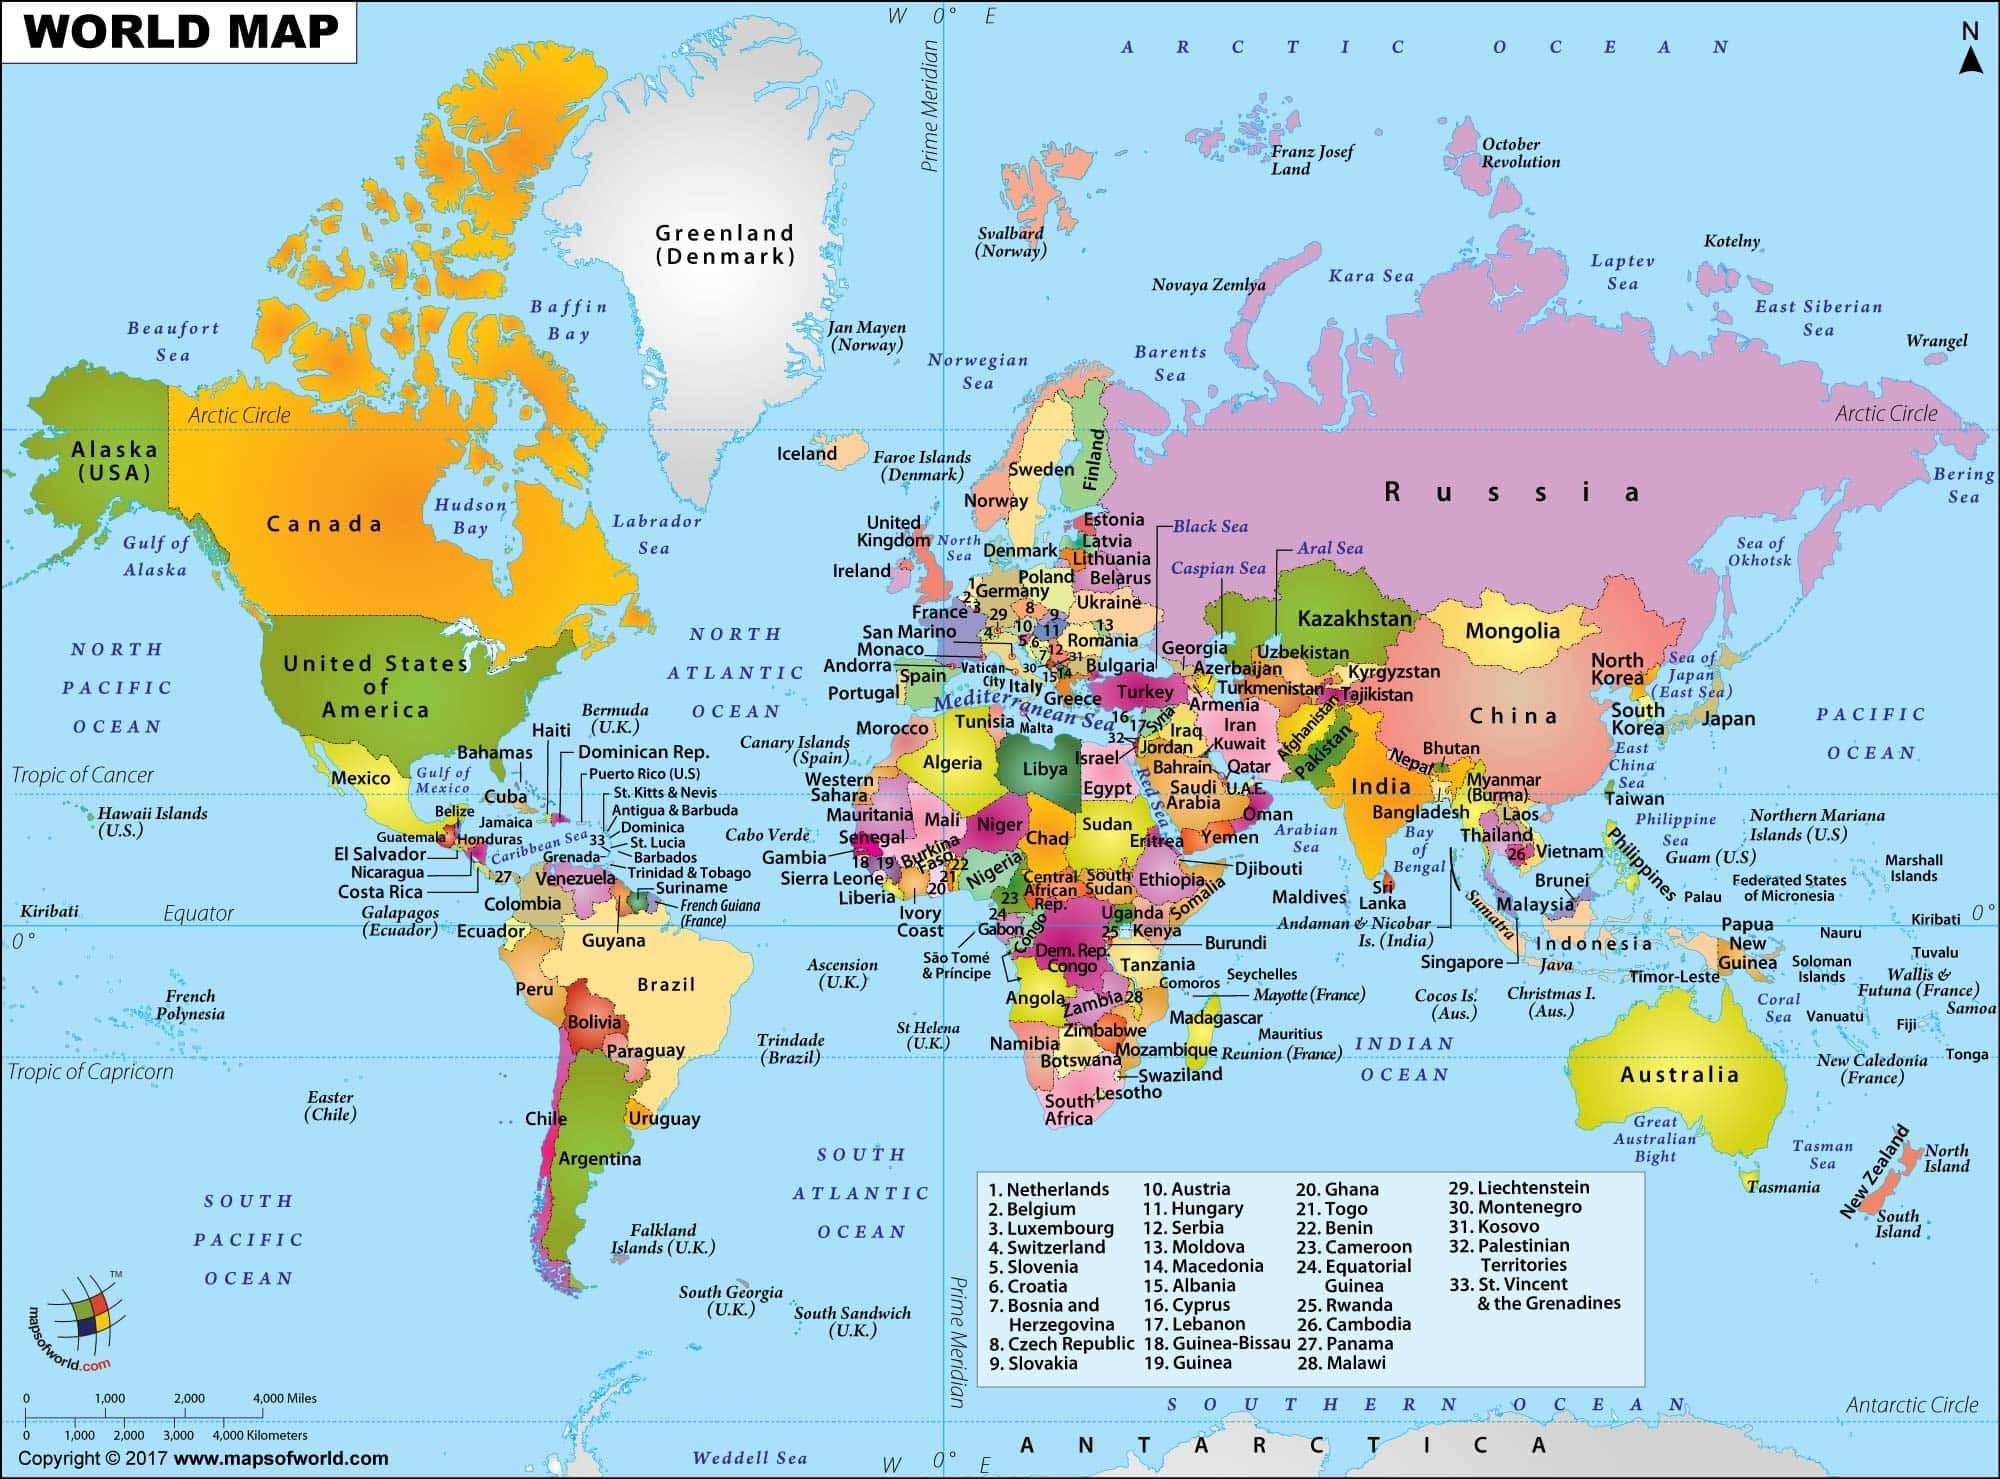 World map desktop wallpaper hd 70 images 2000x1479 world map download 1920x1080 publicscrutiny Gallery